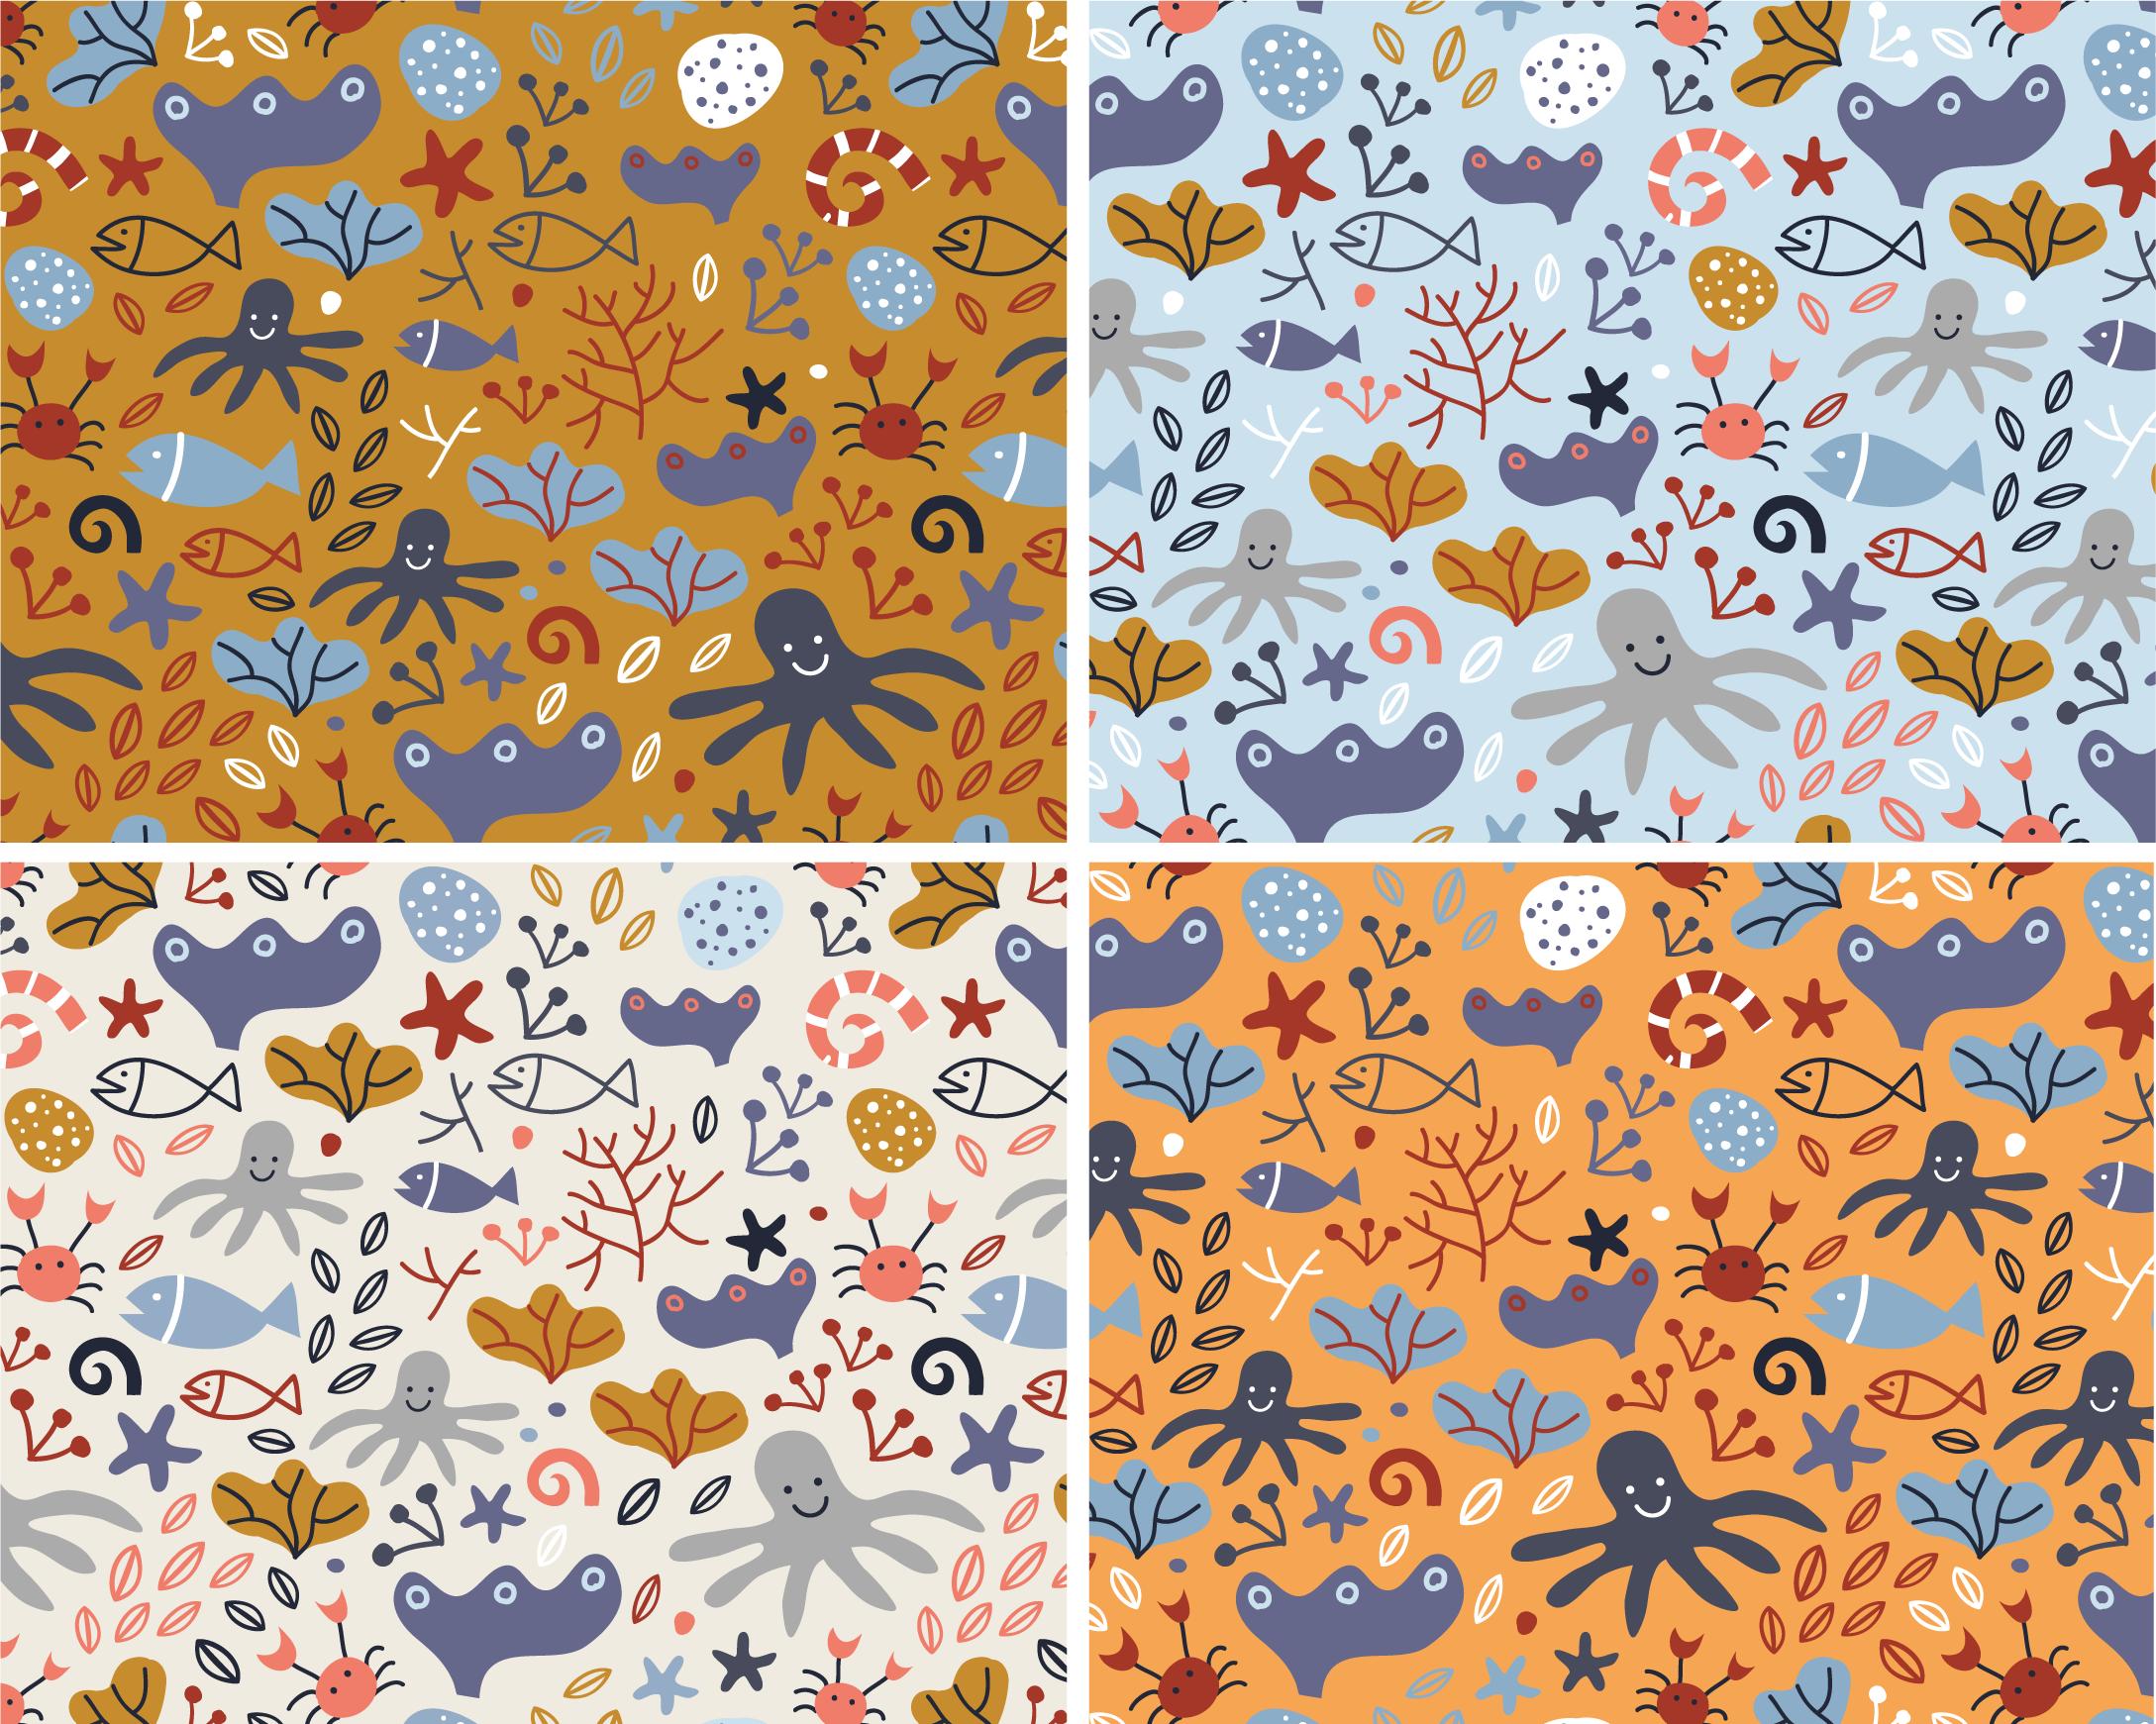 Annalisa Papagna illustration - Sea Life pattern